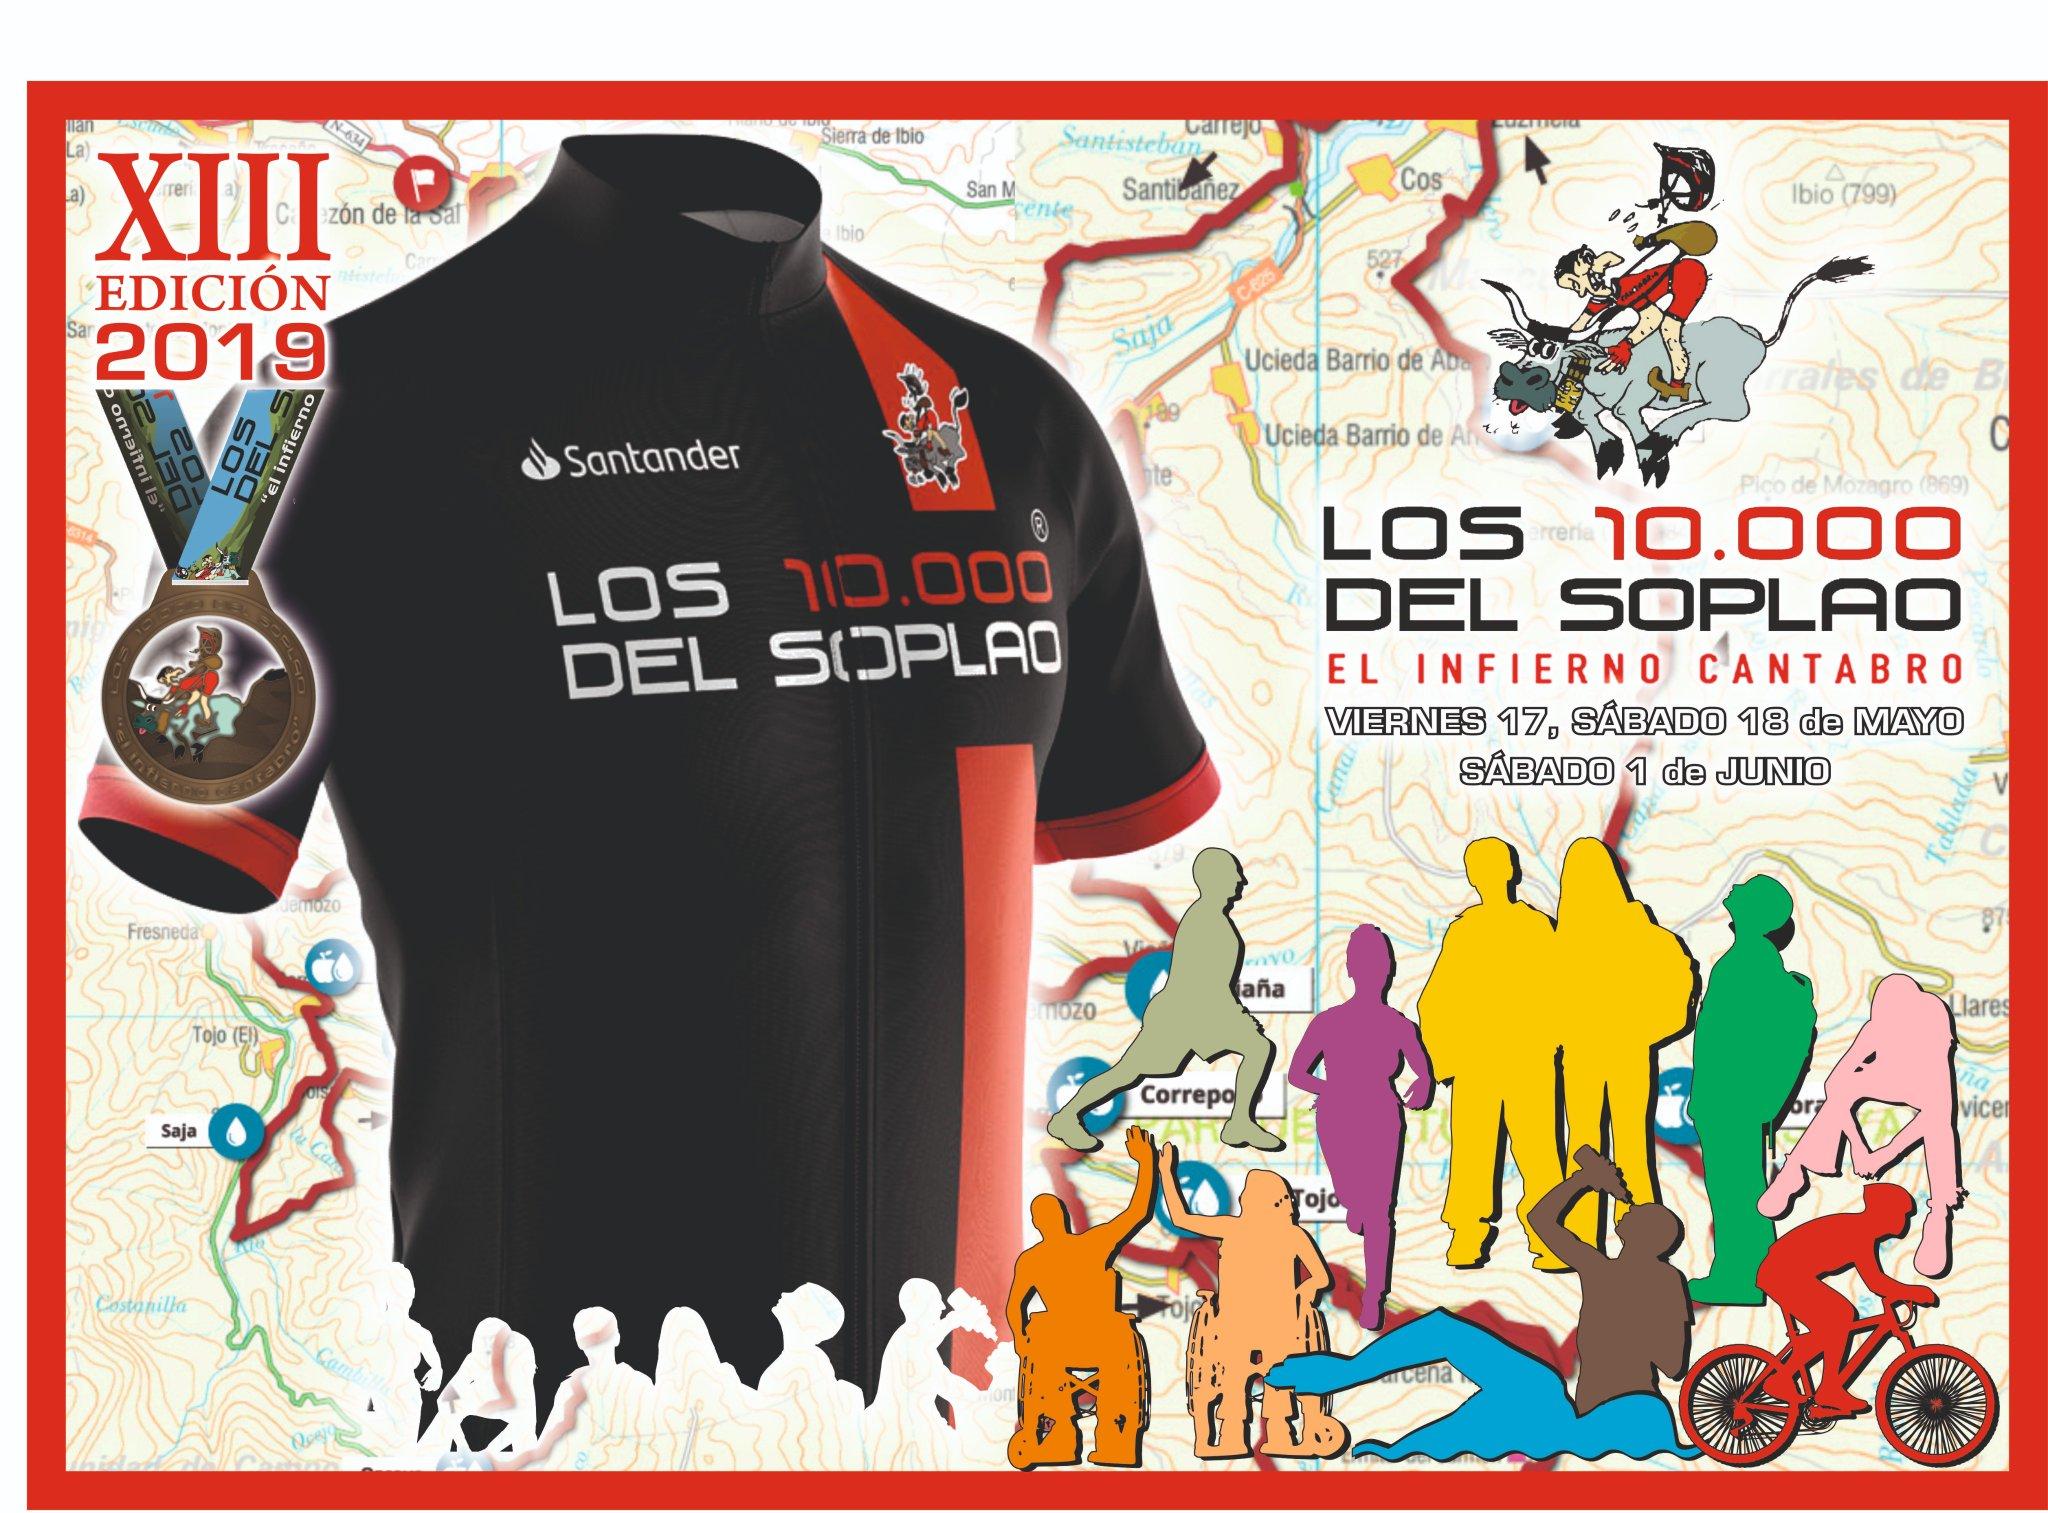 XIII Marcha BTT Los 10.000 del Soplao 2019